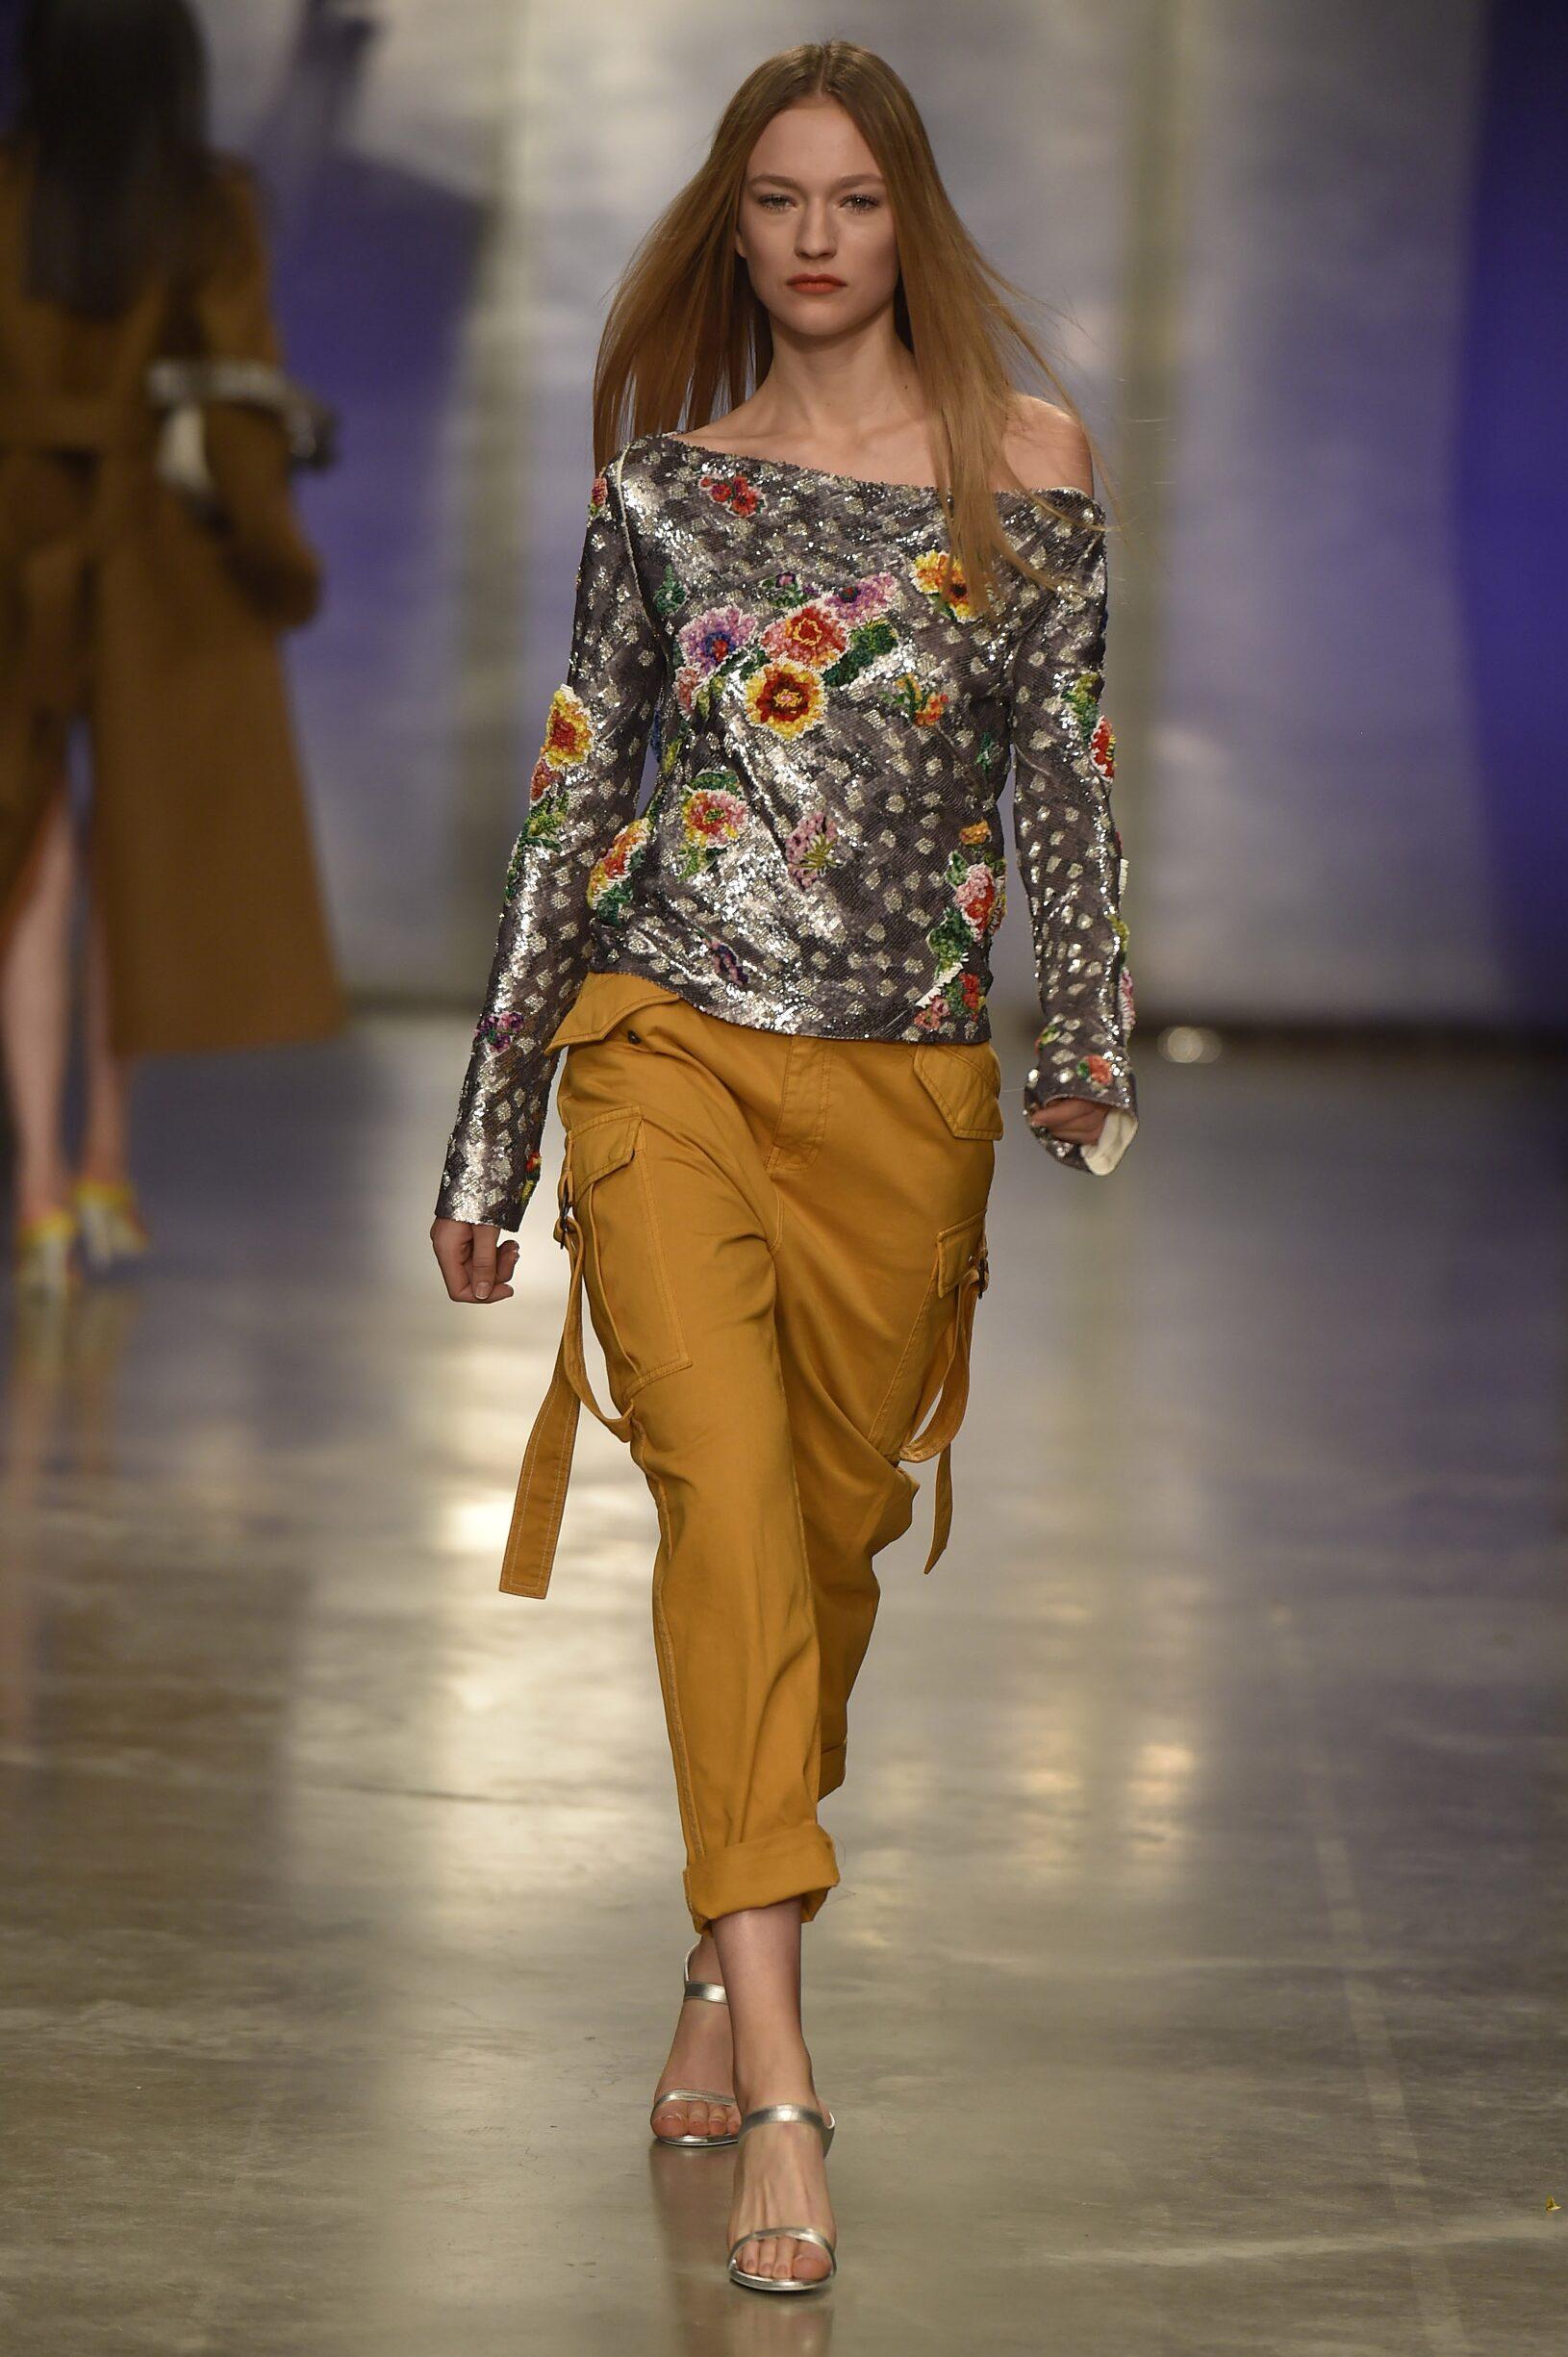 Fall Fashion 2017-18 Topshop Unique